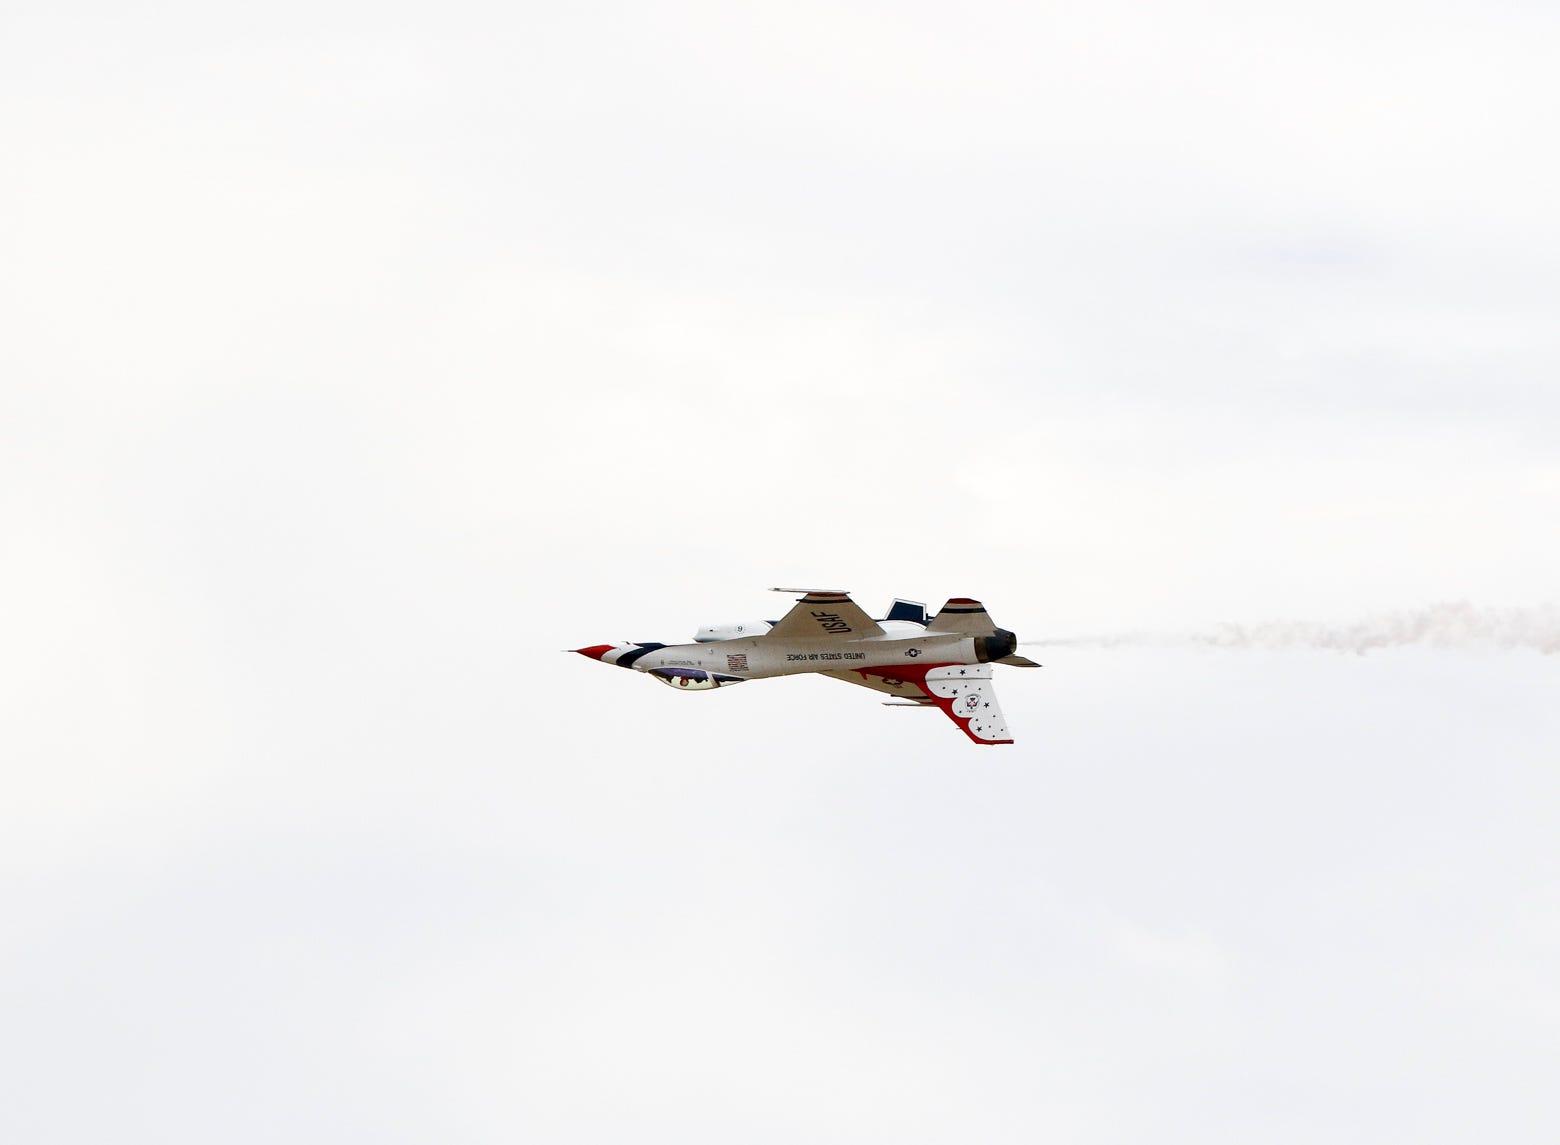 Highlights from the 38th annual California International Airshow, Salinas at the Salinas Municipal Airport on Sunday, September 30, 2018 in Salinas, Calif.